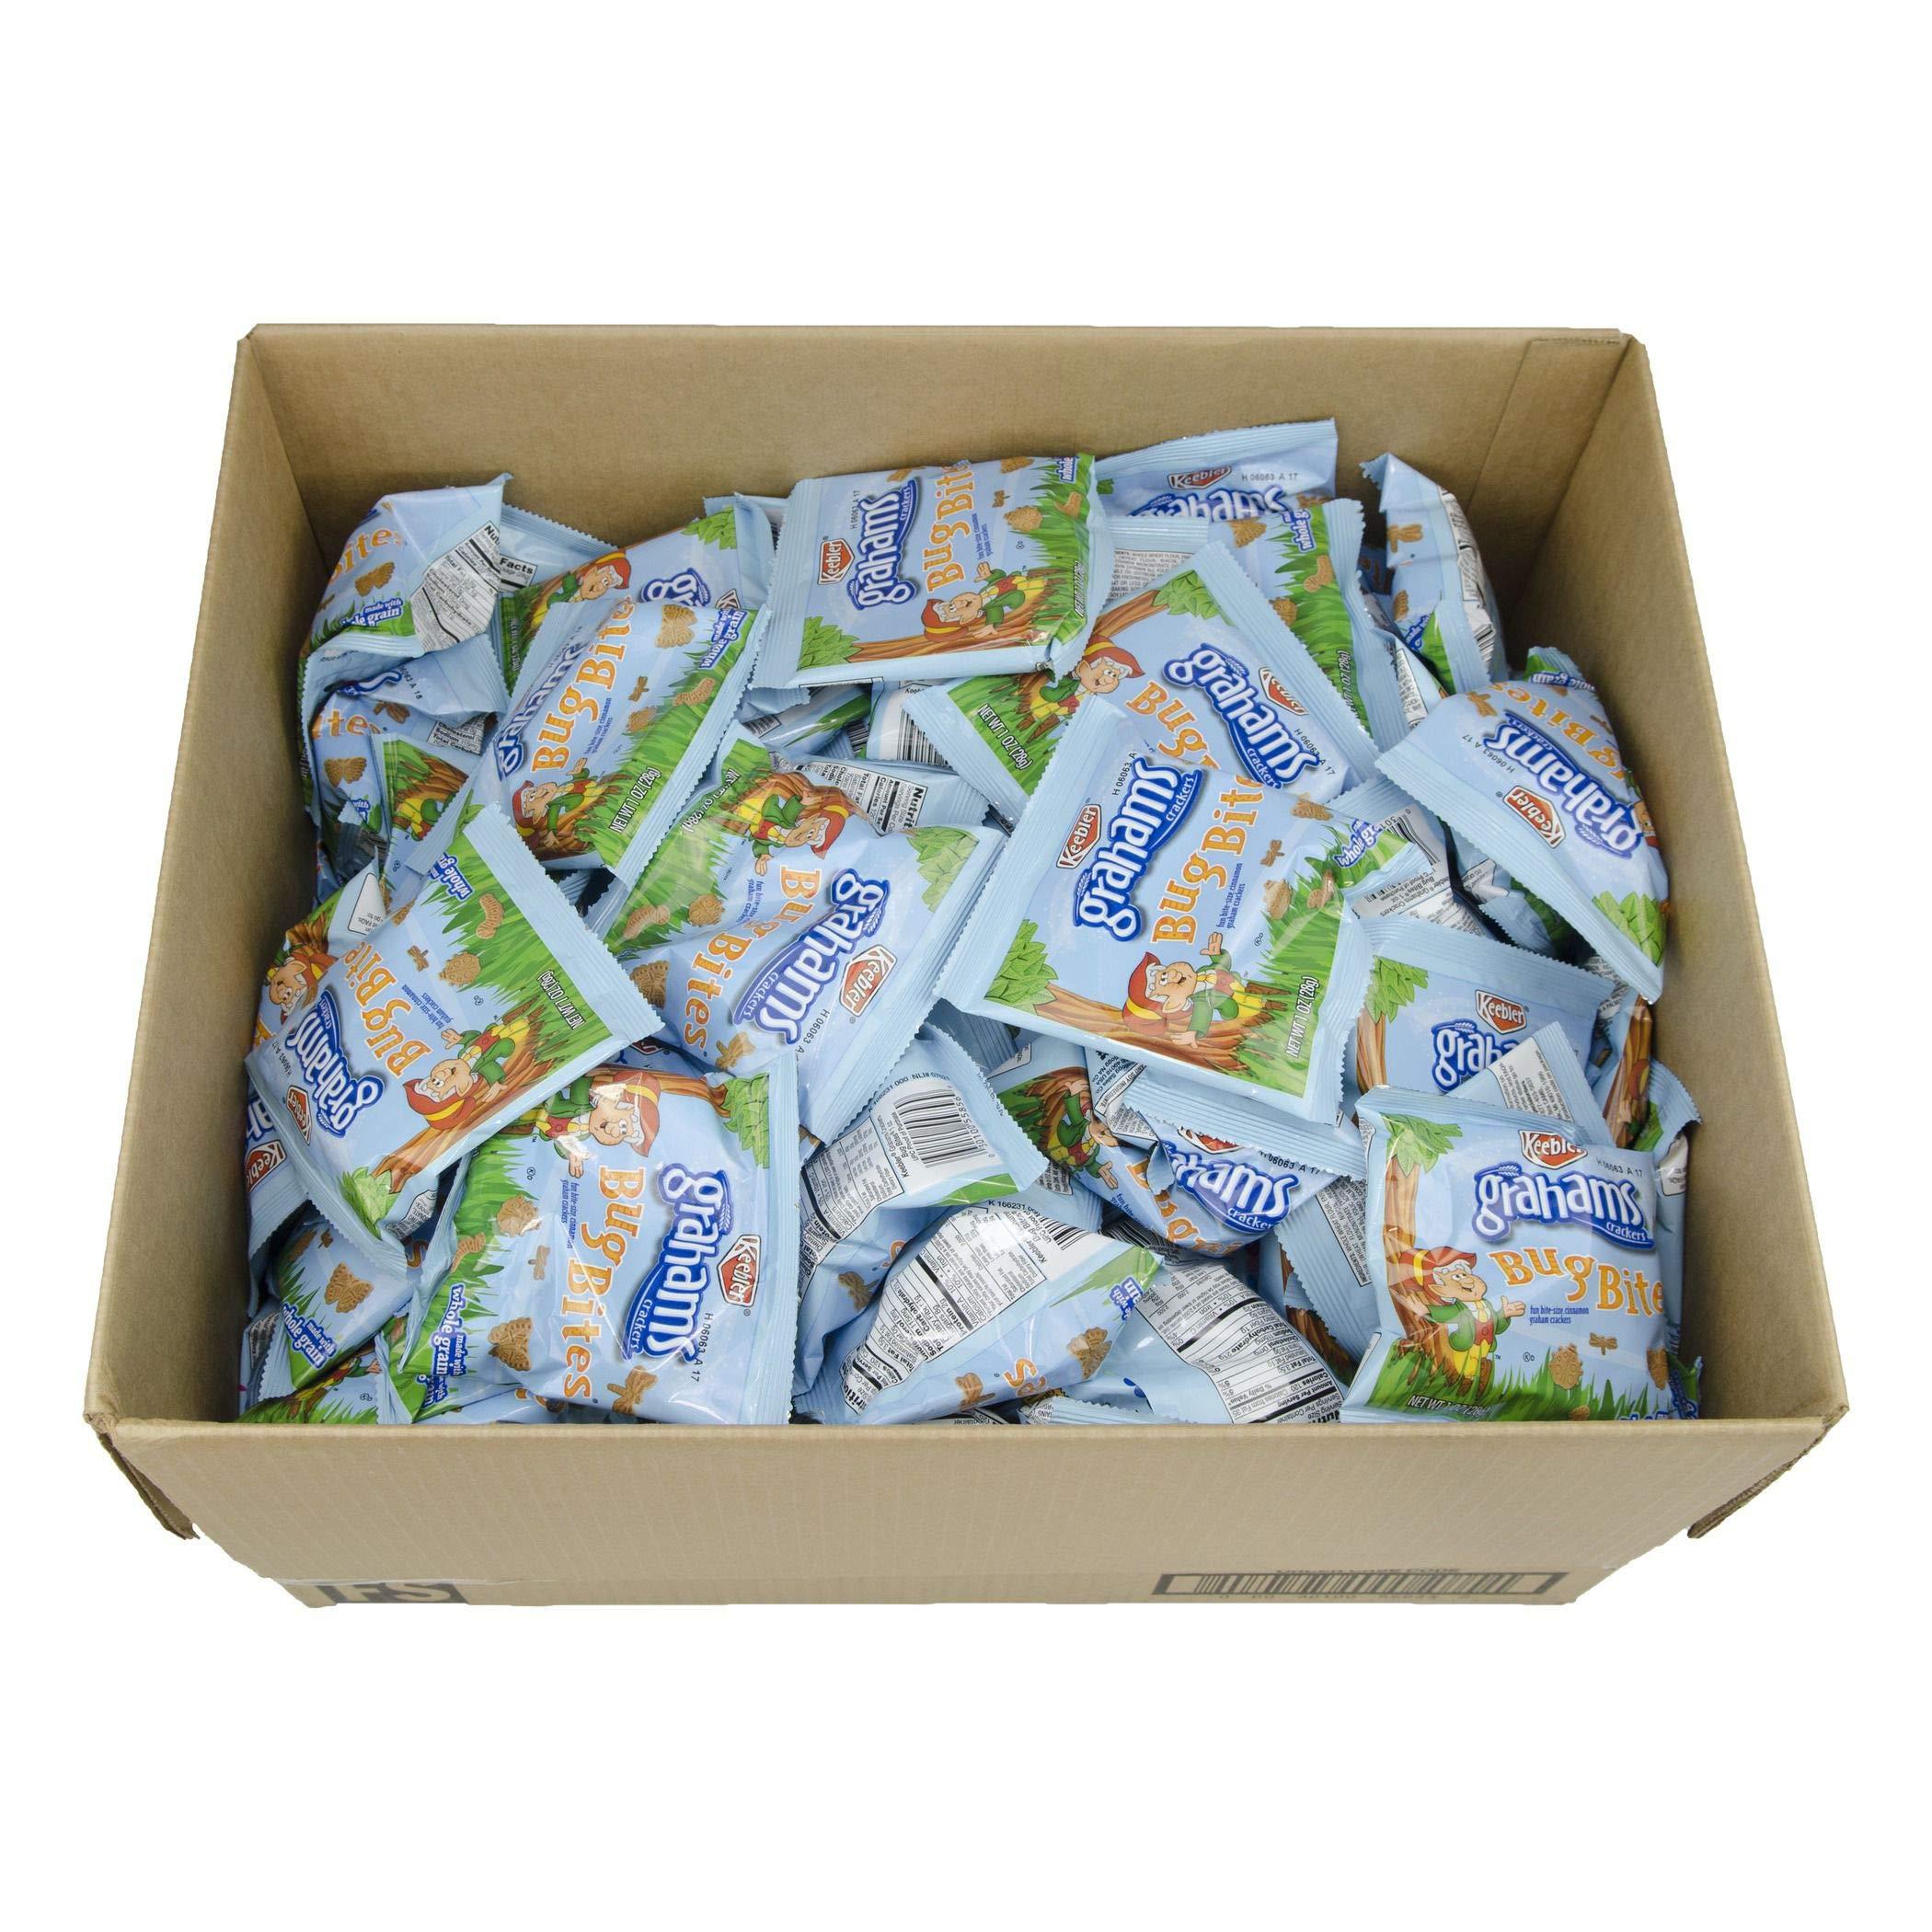 Kellogg's Keebler Grahams Crackers, Bug Bites Cinnamon, 1 Oz. Snack Packs (Box of 210)